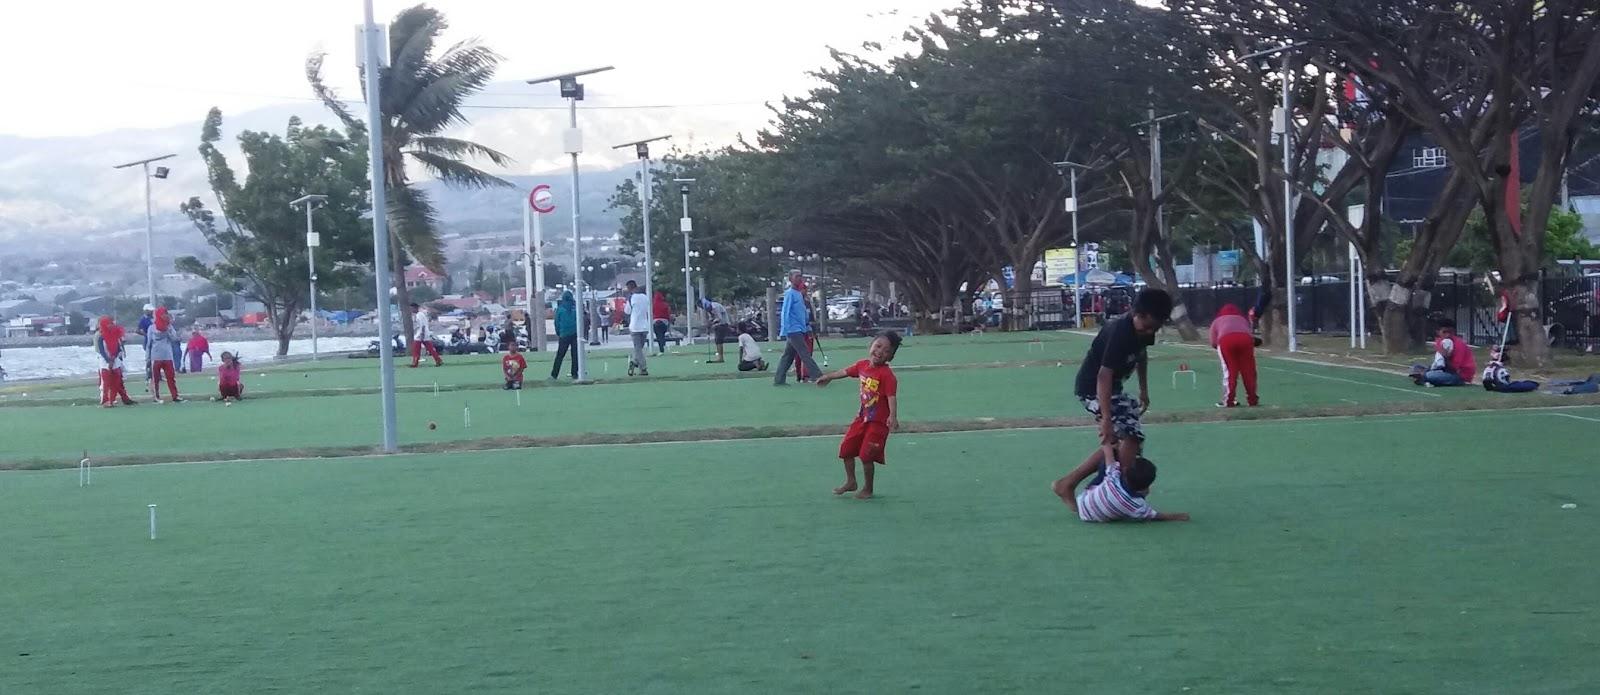 Lapangan Gateball Anjungan Nusantara Merampas Hak Publik Kota Palu